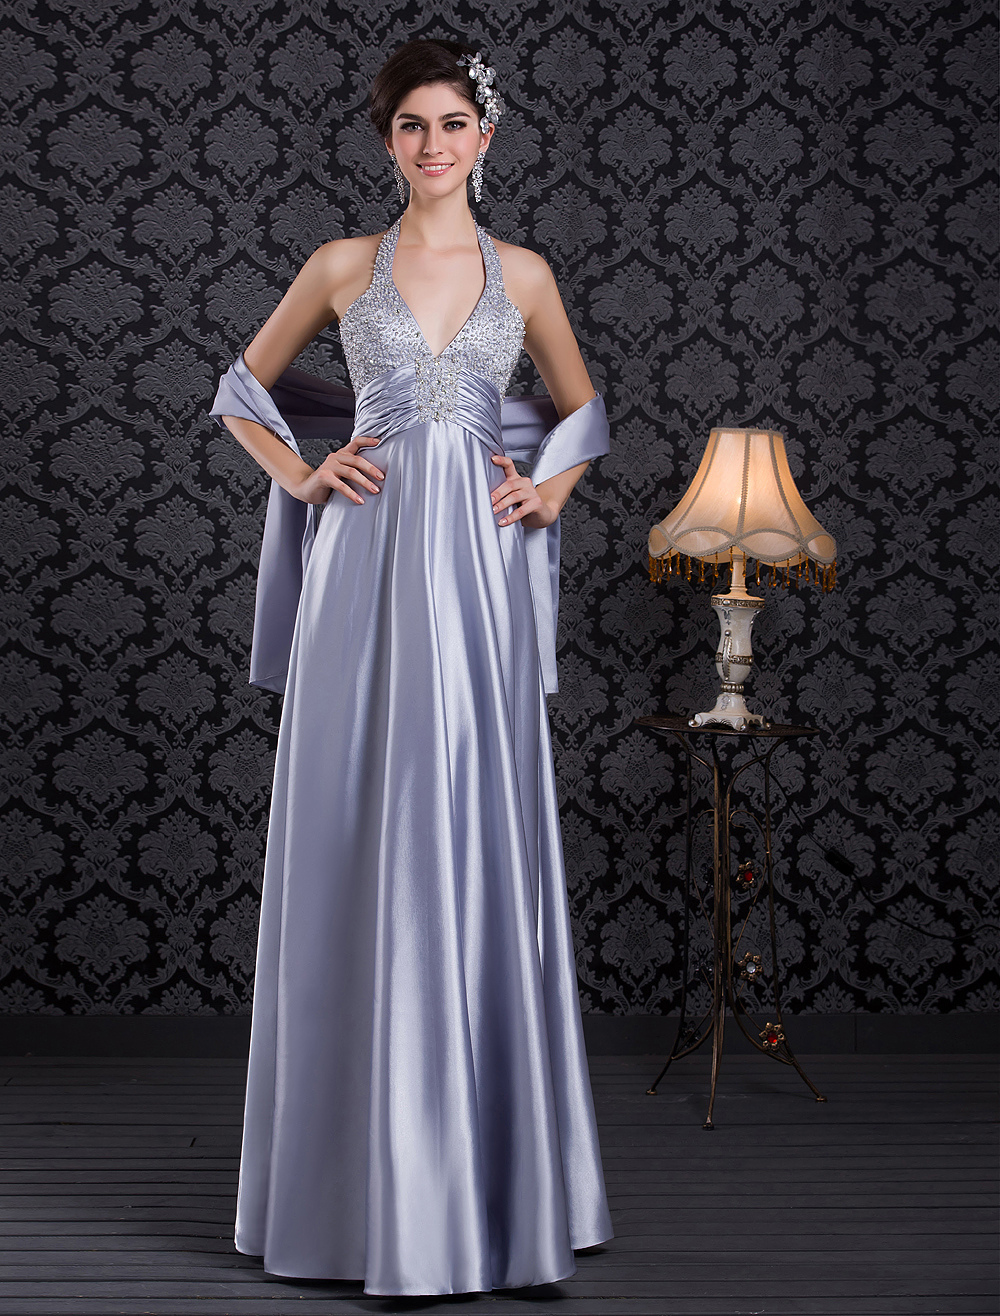 Baby Blue Evening Dress Halter Beading Party Dress V Neck Backless Satin Long Prom Dress (Wedding Evening Dresses) photo